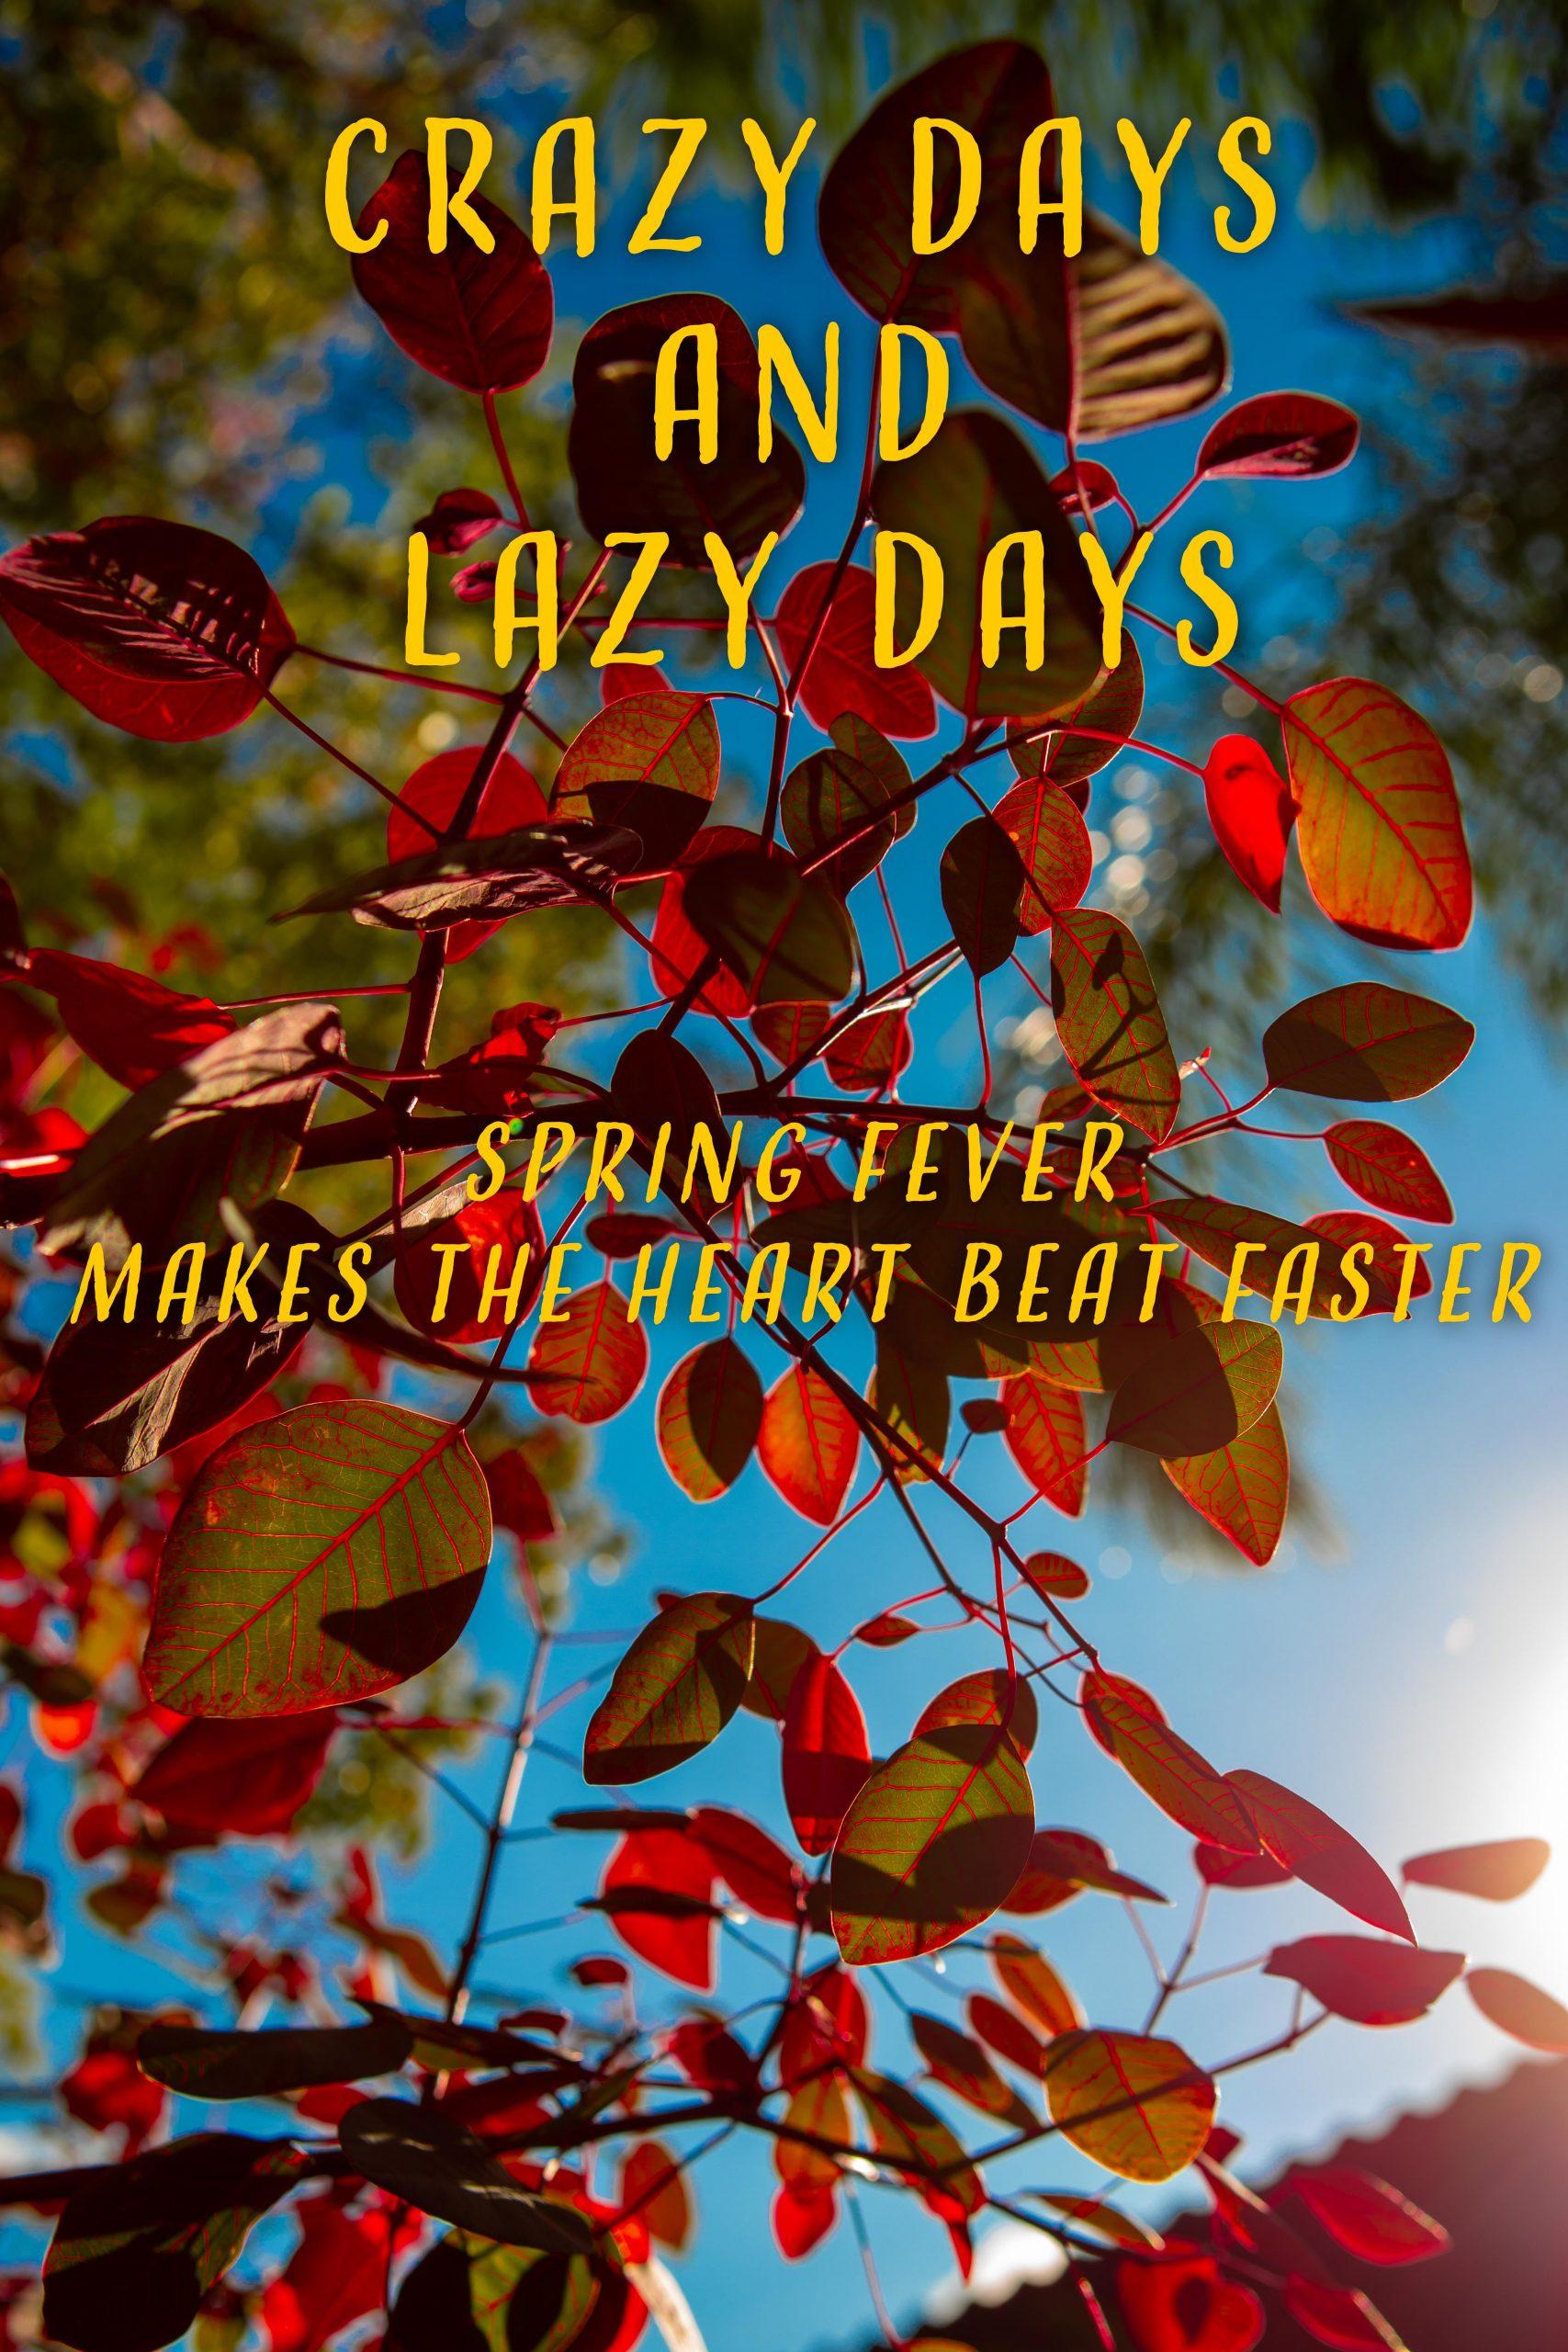 Crazy Days and Lazy Days 28 Oct